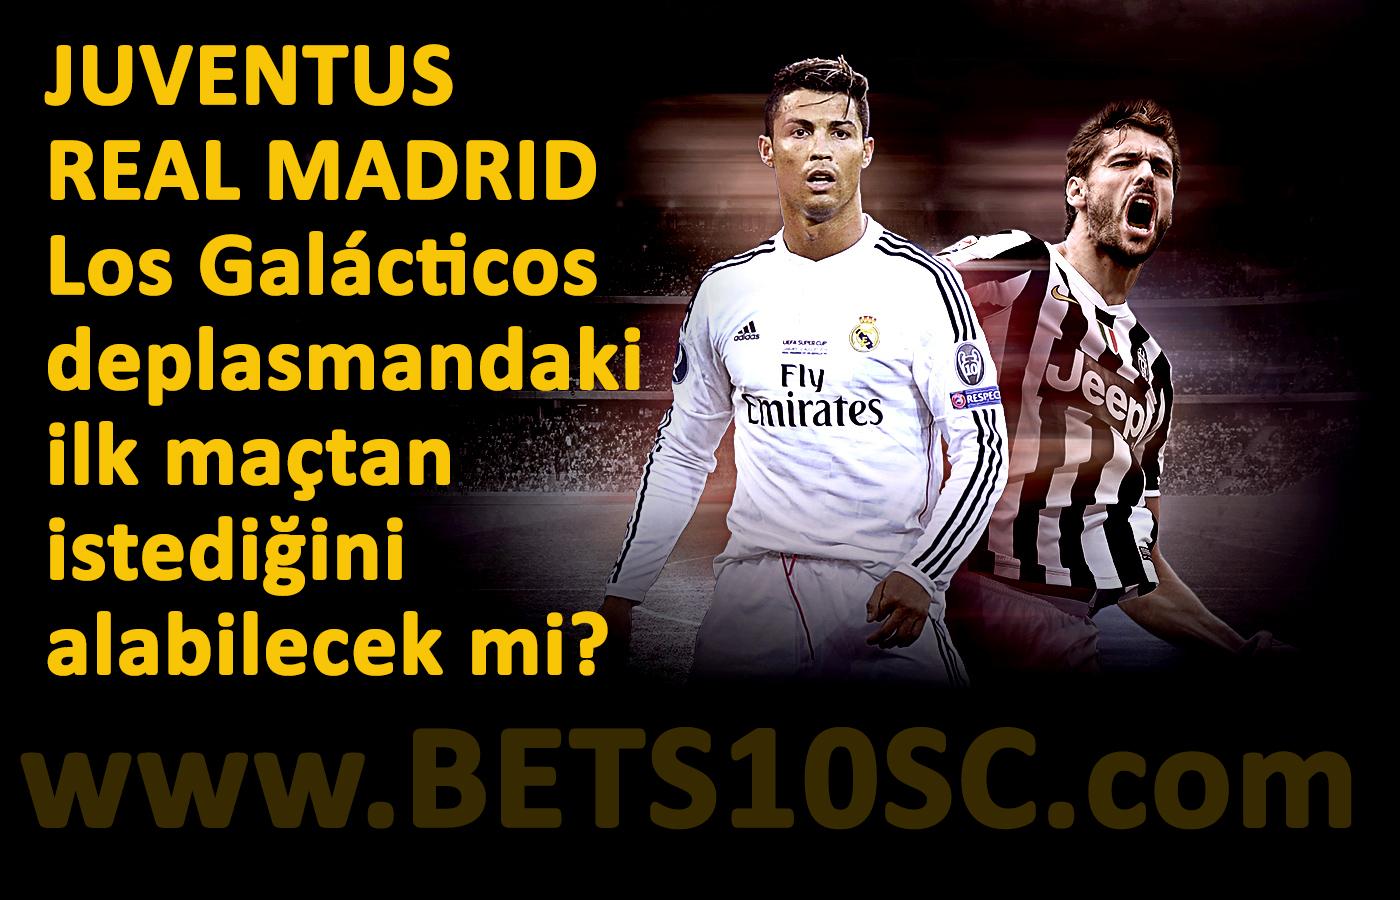 JUVENTUS REAL MADRID Los Galácticos deplasmandaki ilk maçtan istediğini alabilecek mi?